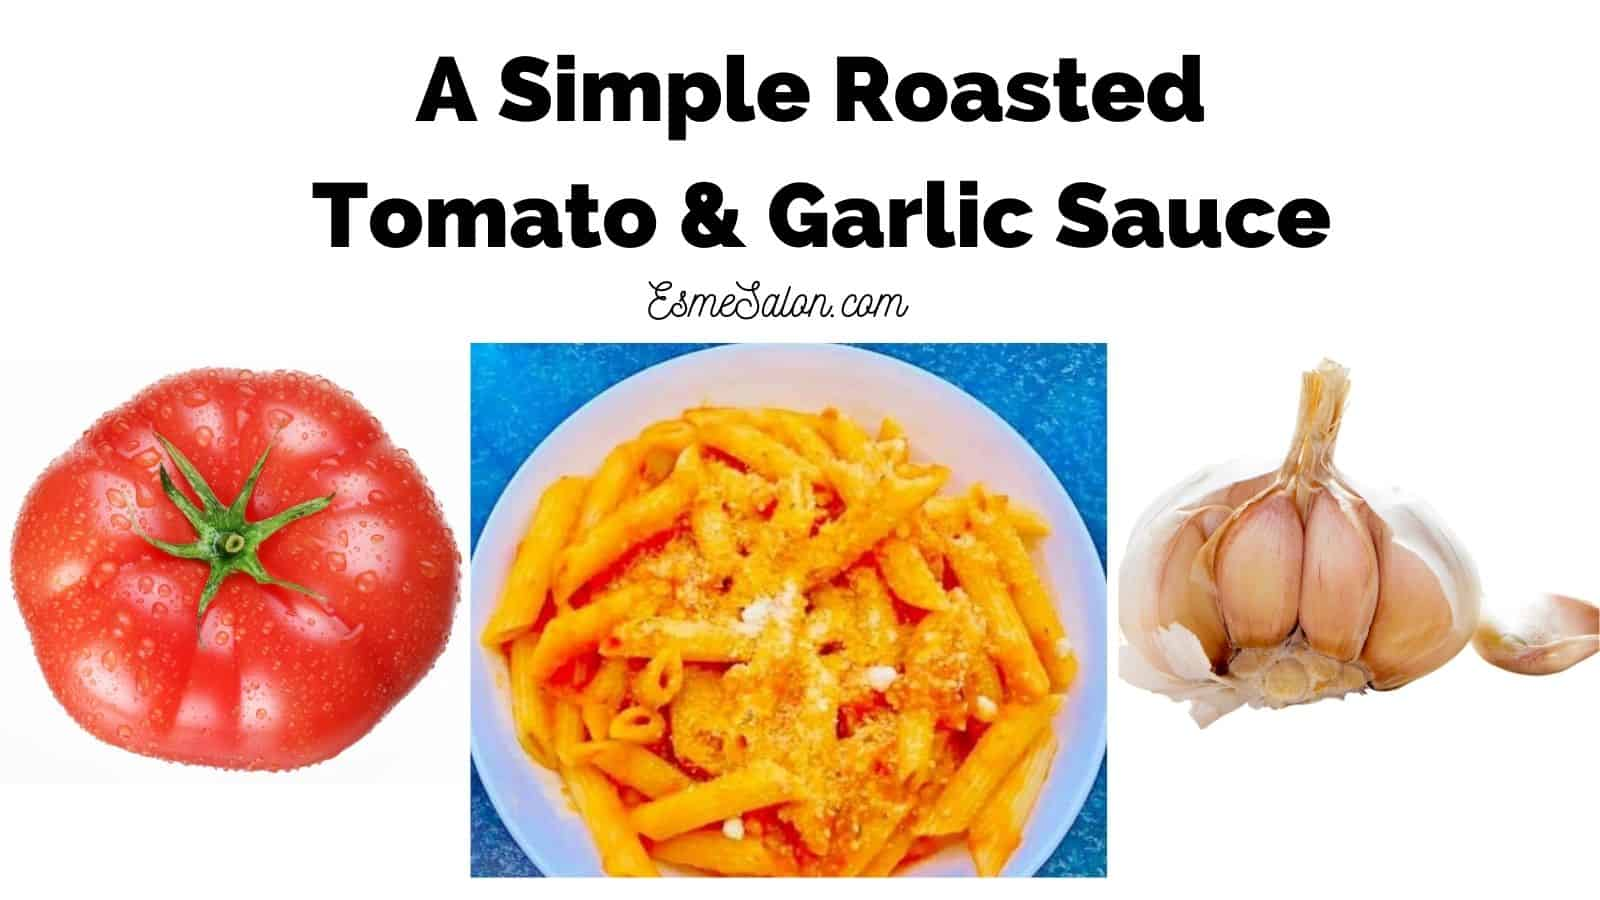 Homemade roasted tomato and garlic sauce with Arrabbiata pasta